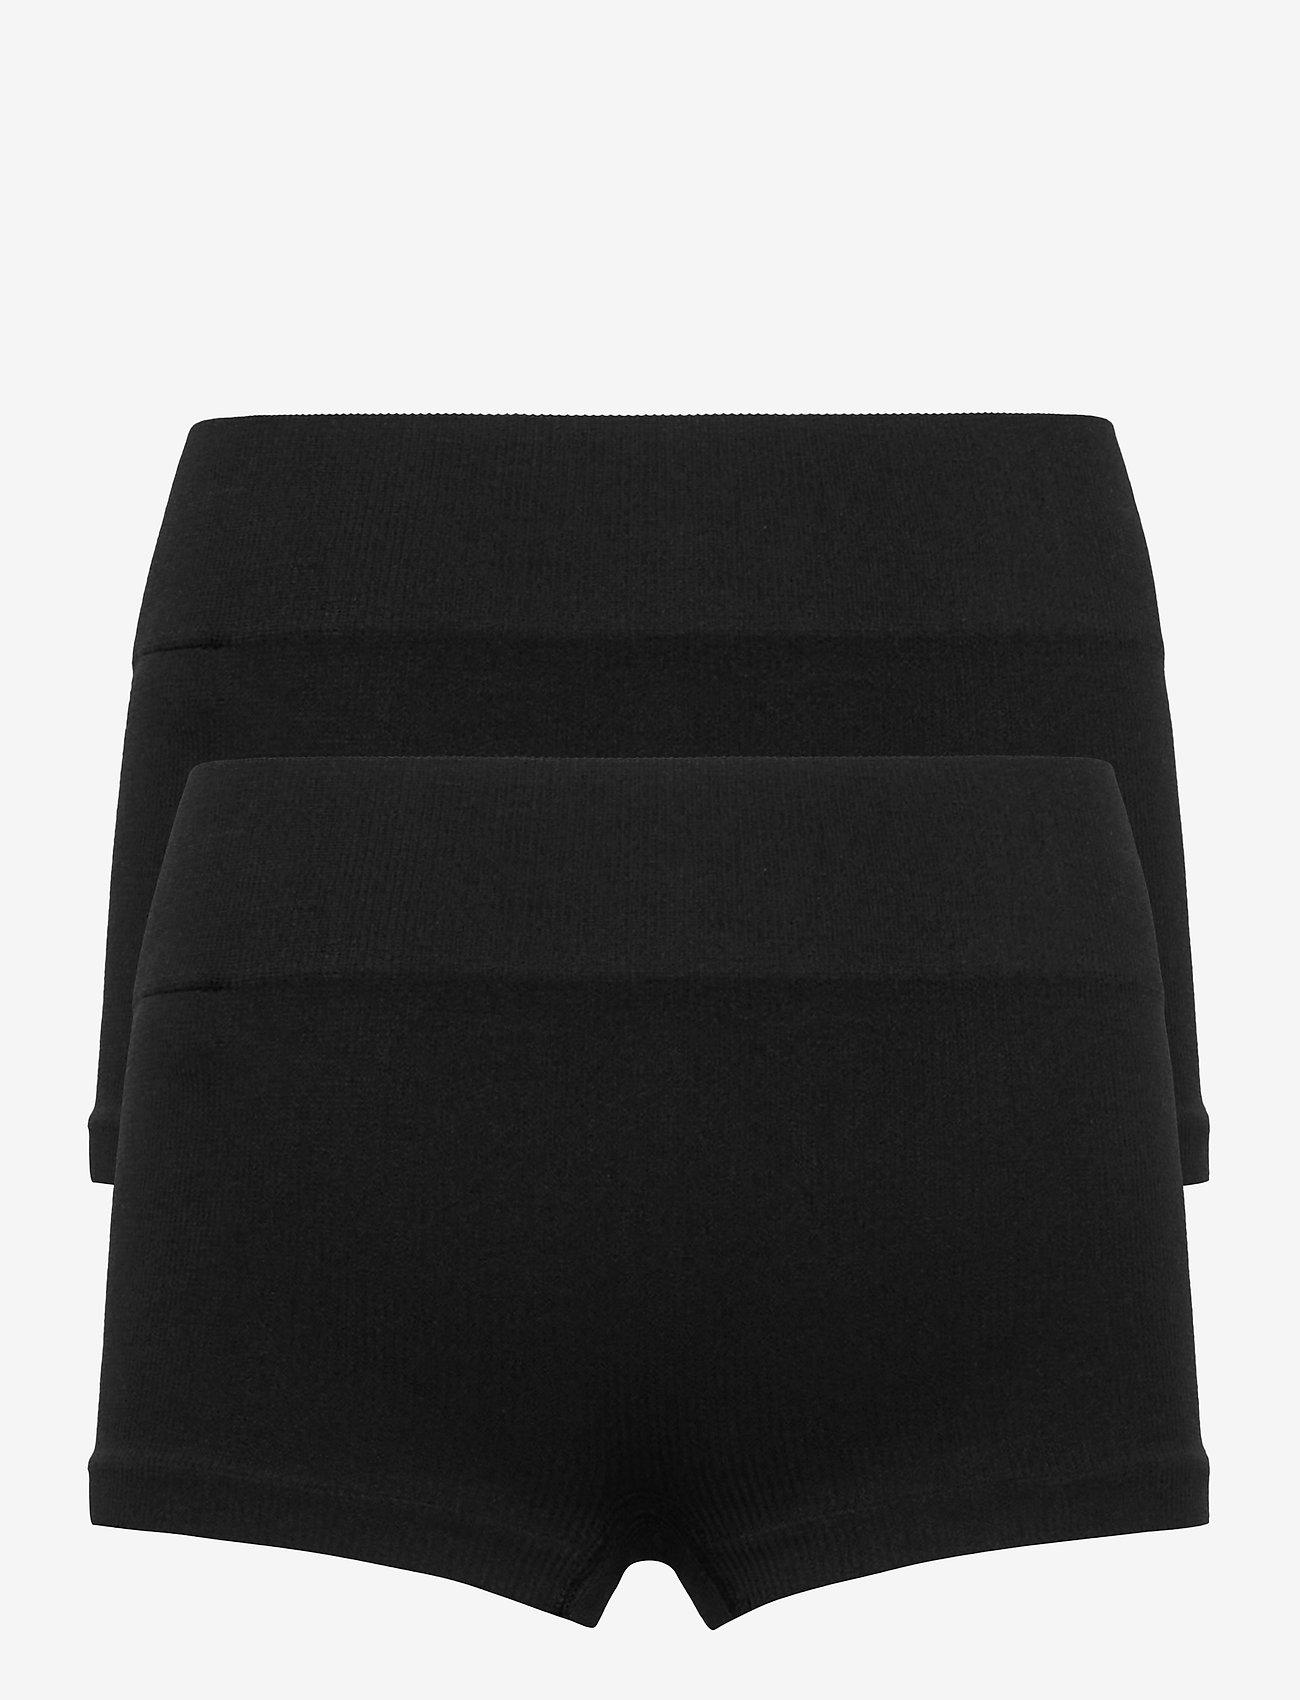 LMTD - NLFHAILEY RIB HIPSTER 2PACK - shorts - black - 1